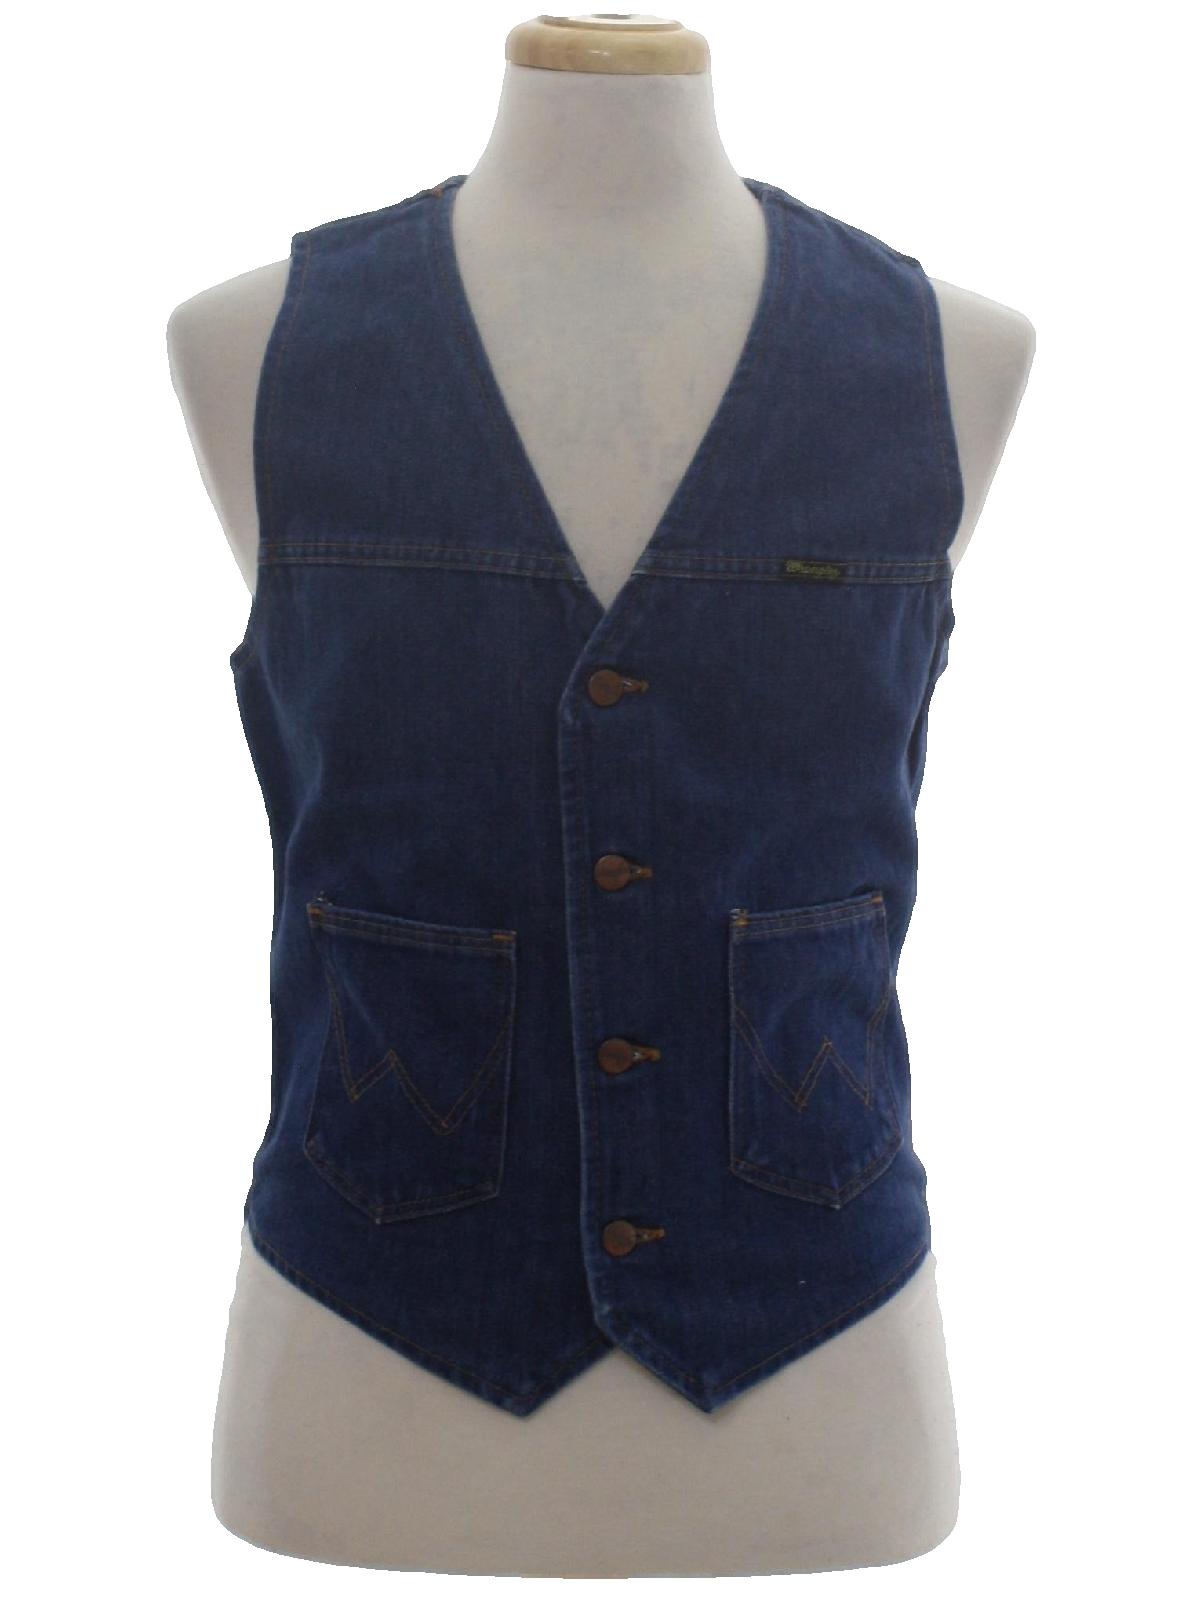 e5d0d441 Retro Seventies Vest: Late 70s or Early 80s -Wrangler- Mens dark ...